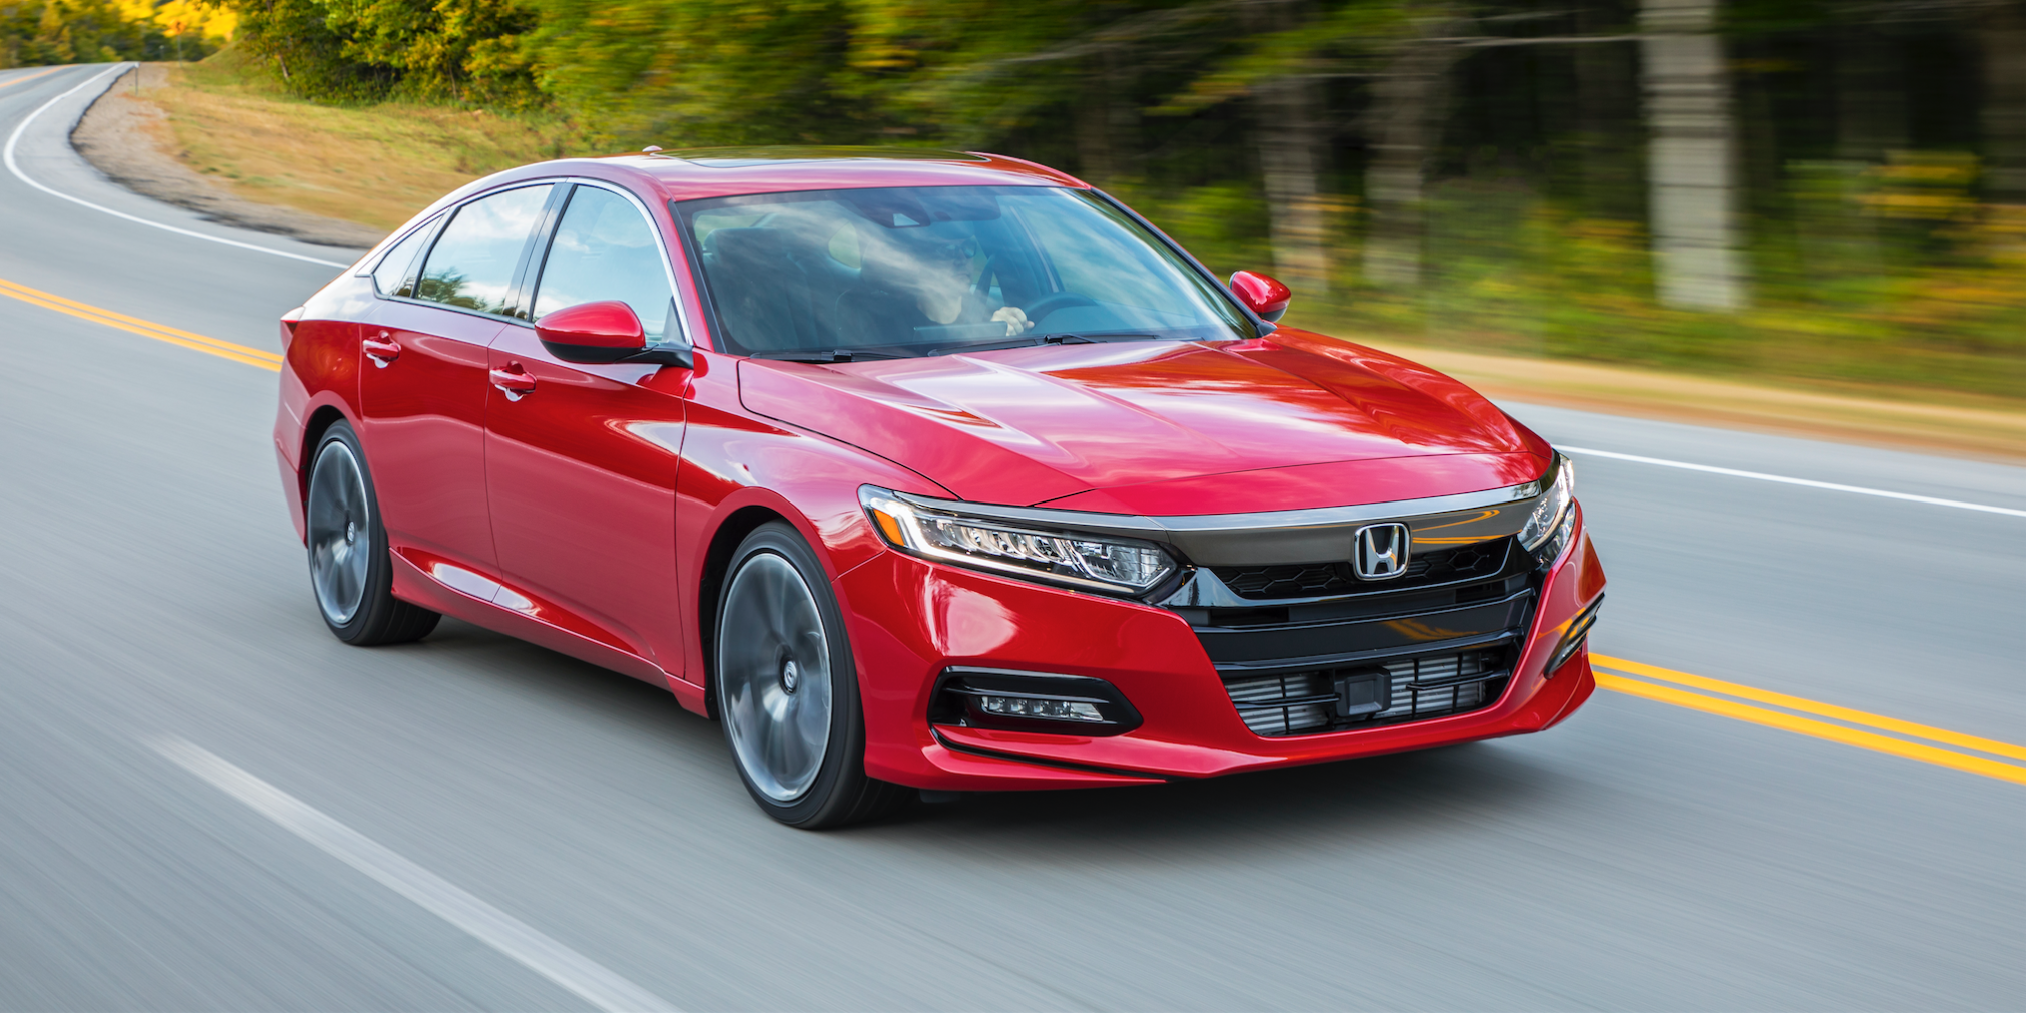 2020 Honda Accord Prices Rise by 185385 Honda accord